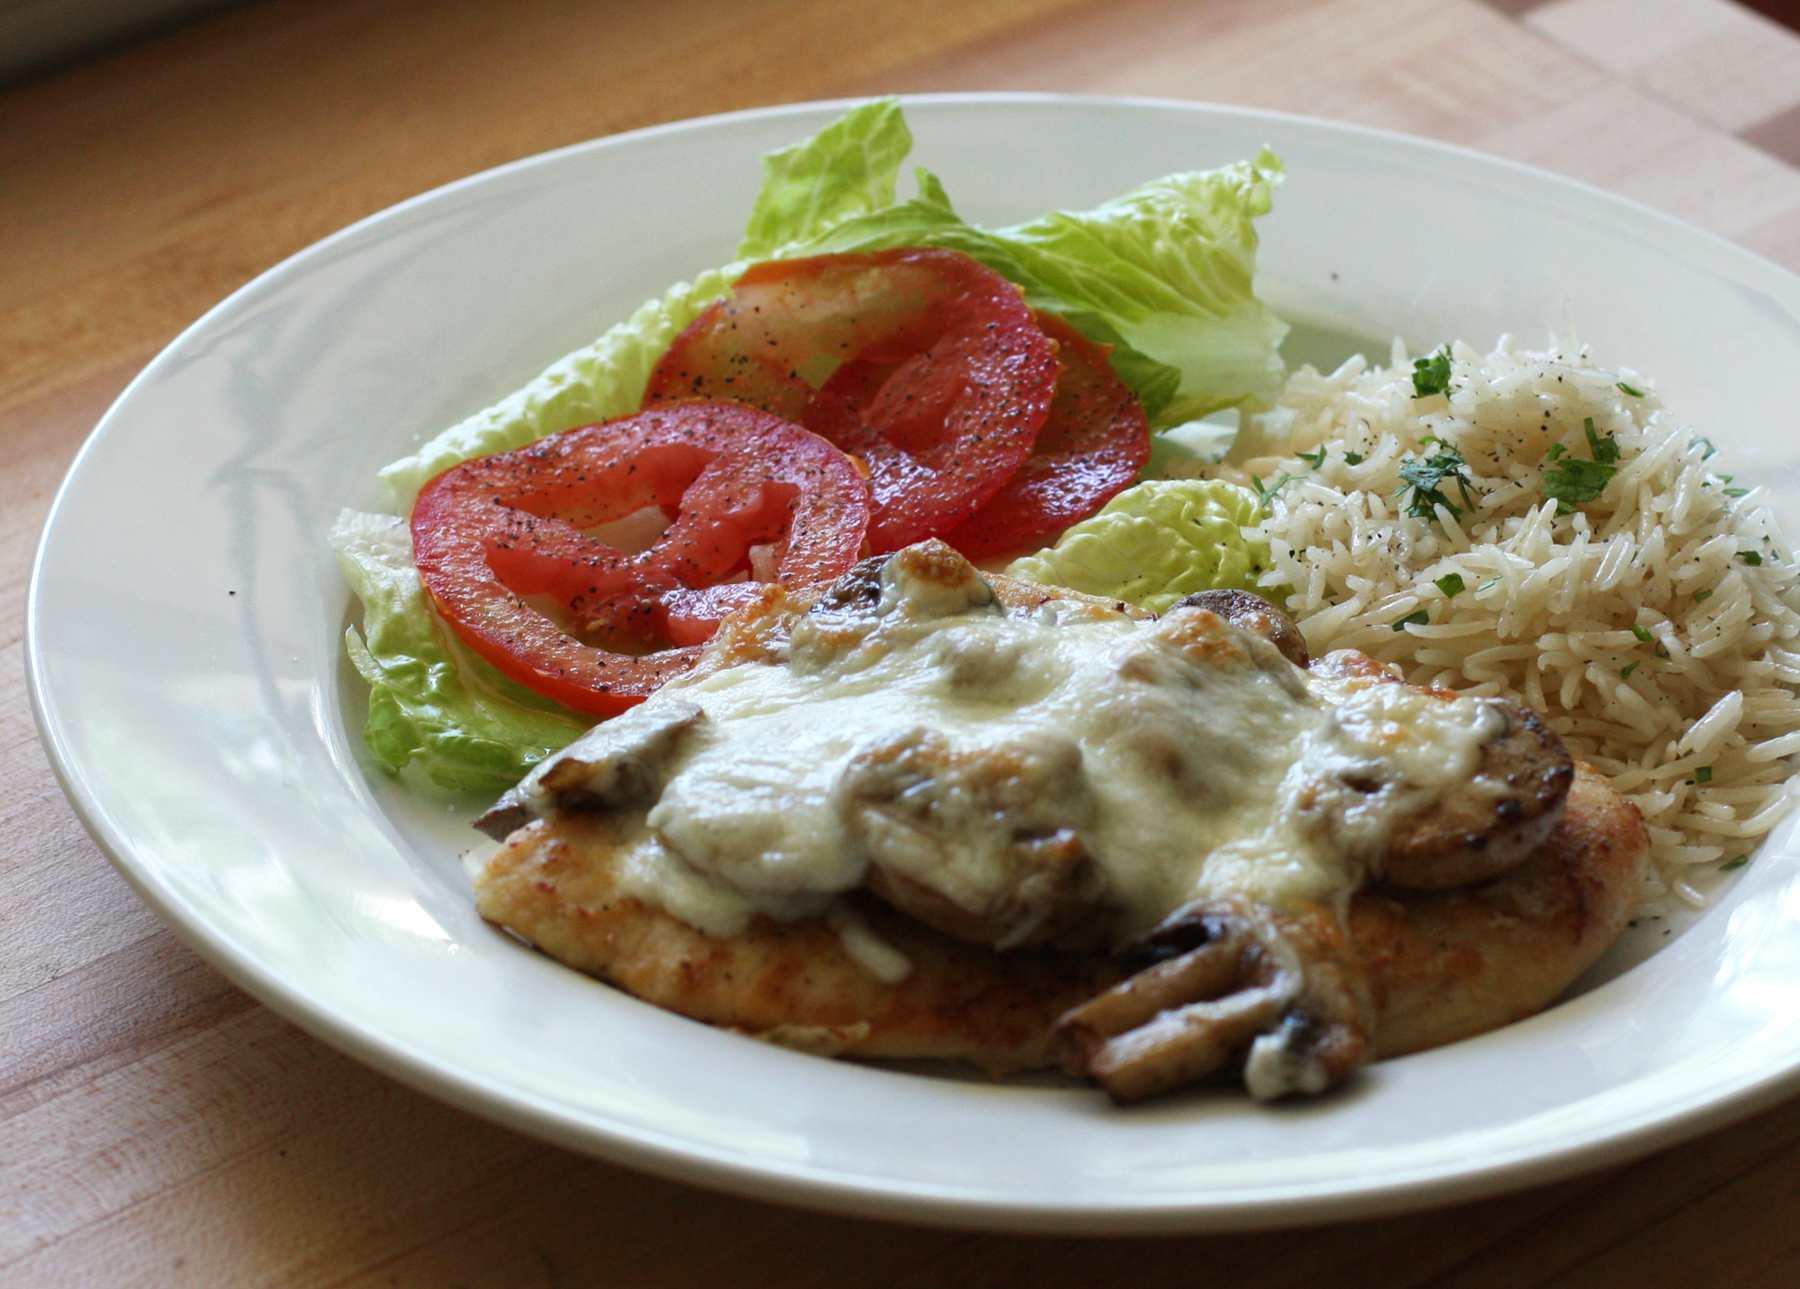 Easy Chicken With Mozzarella Cheese